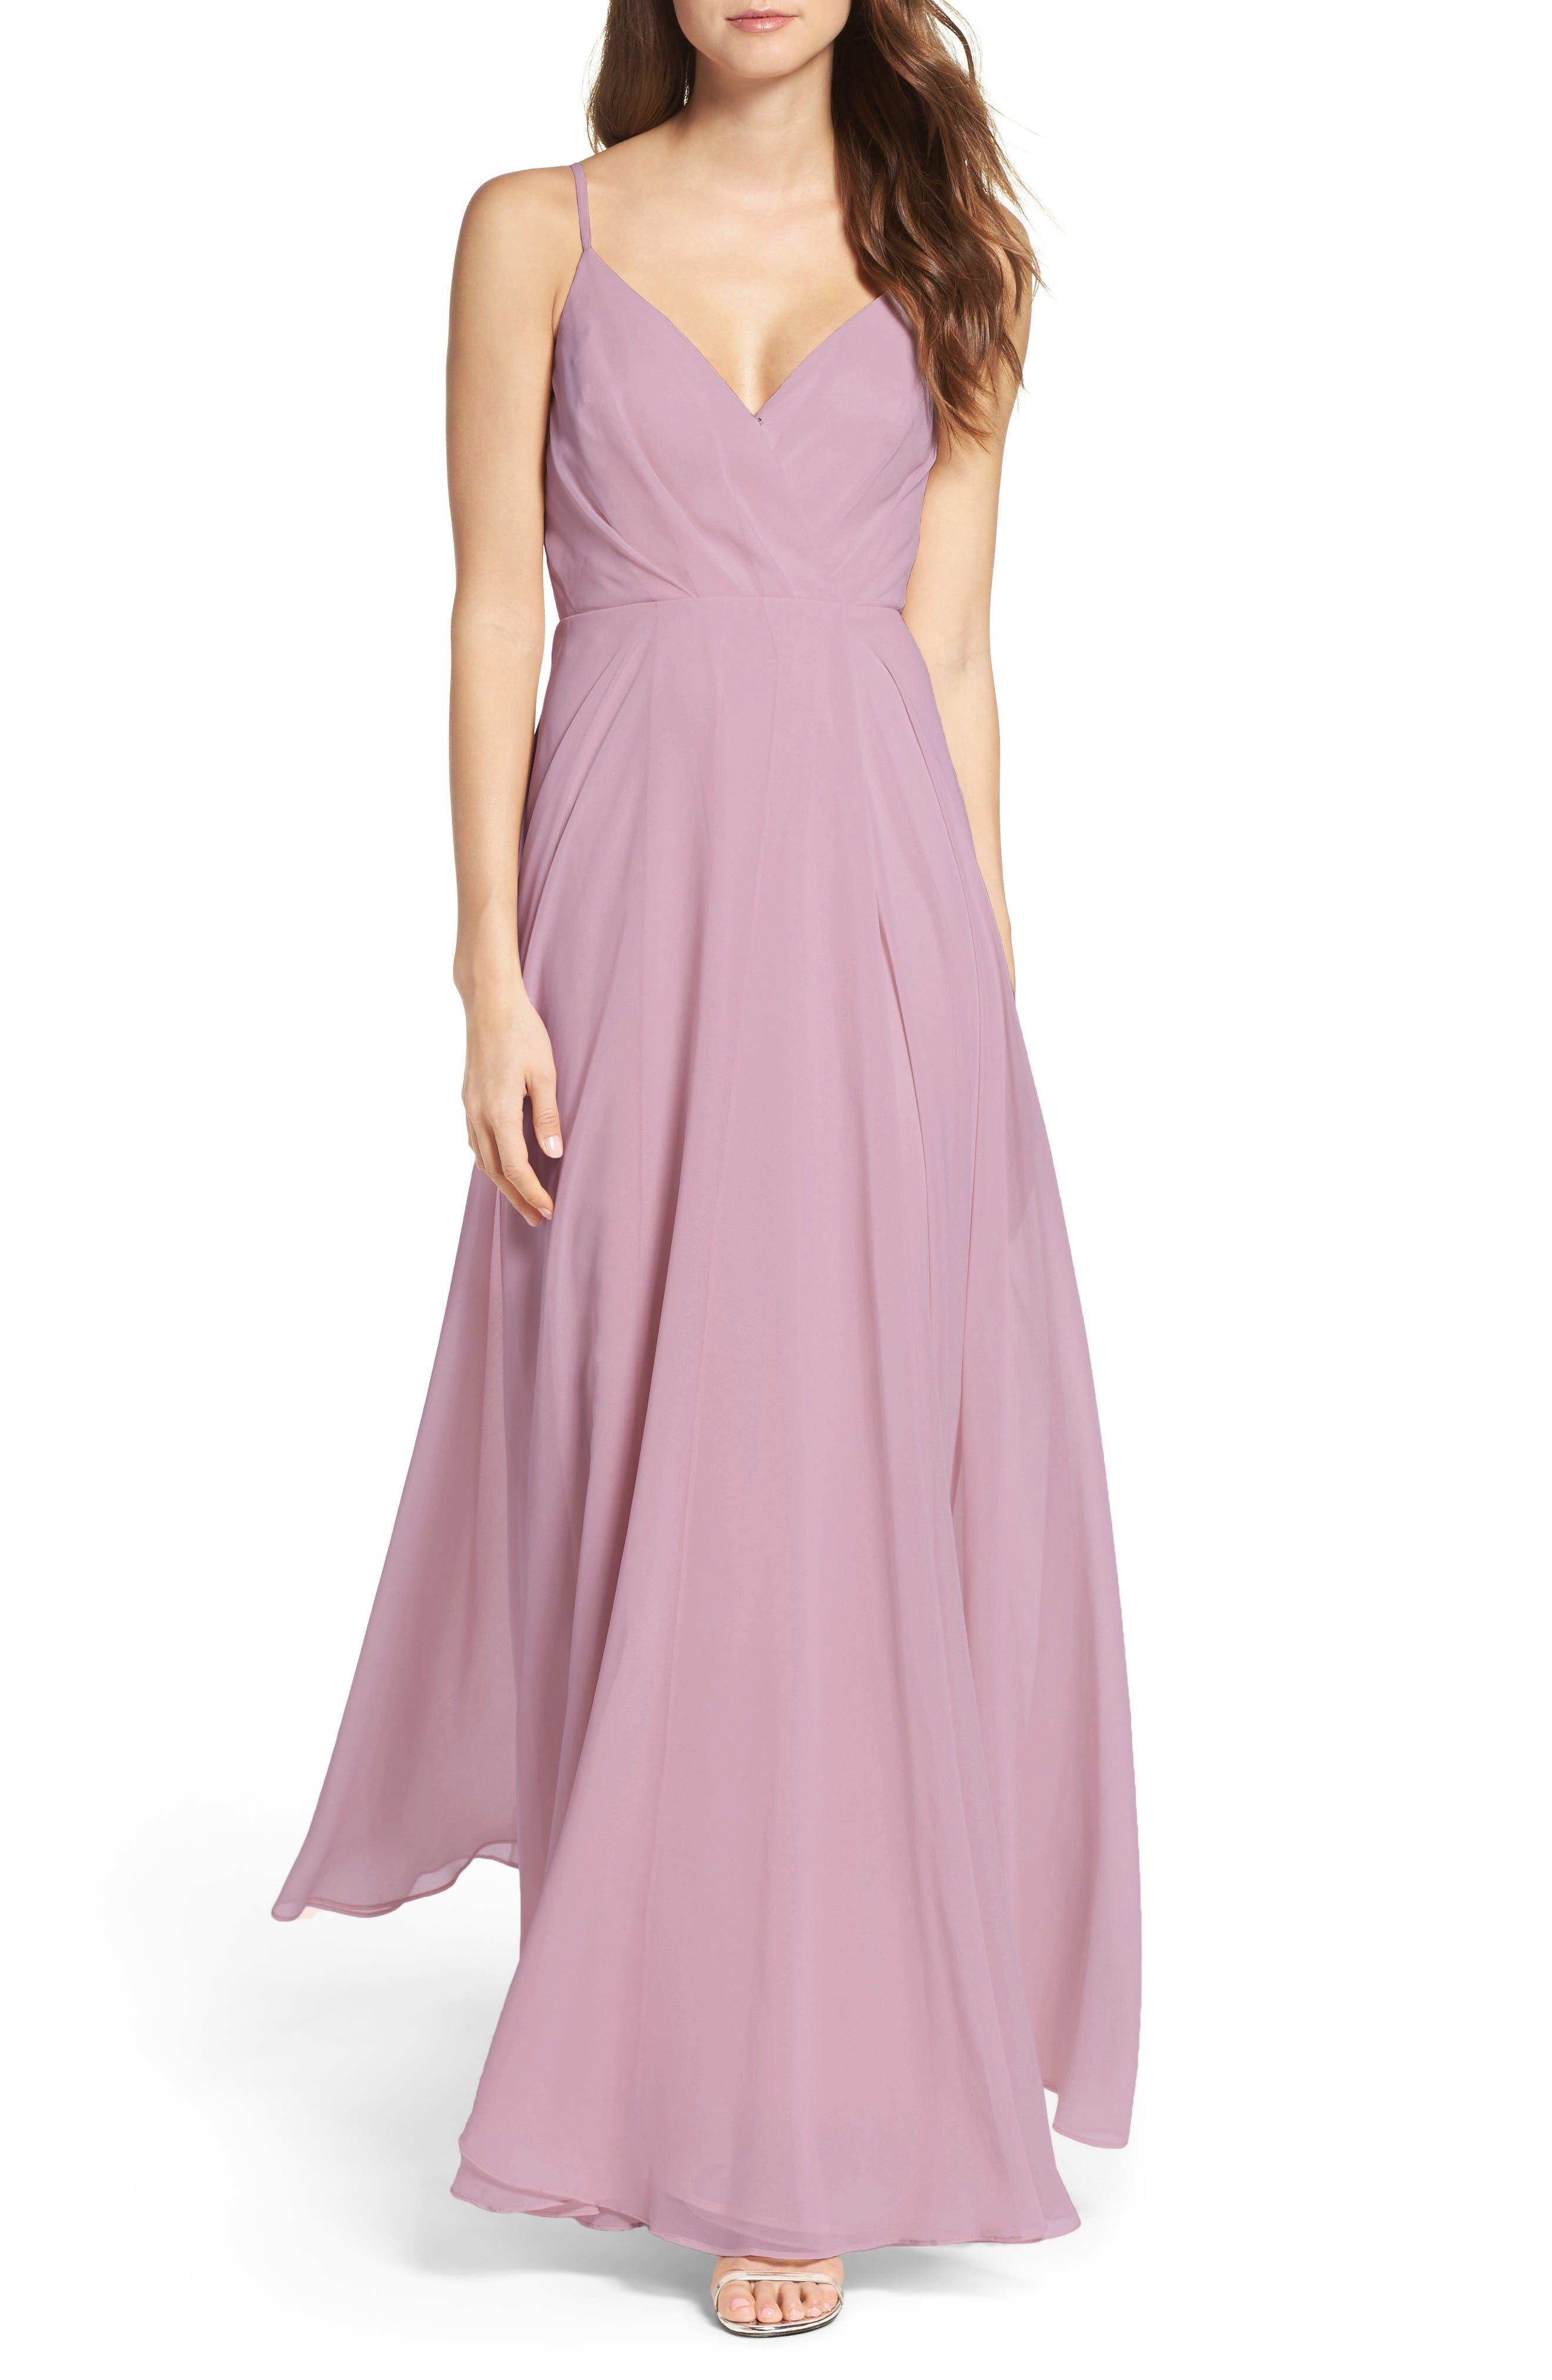 Alternate Image 1 Selected - Lulus Surplice Chiffon Gown